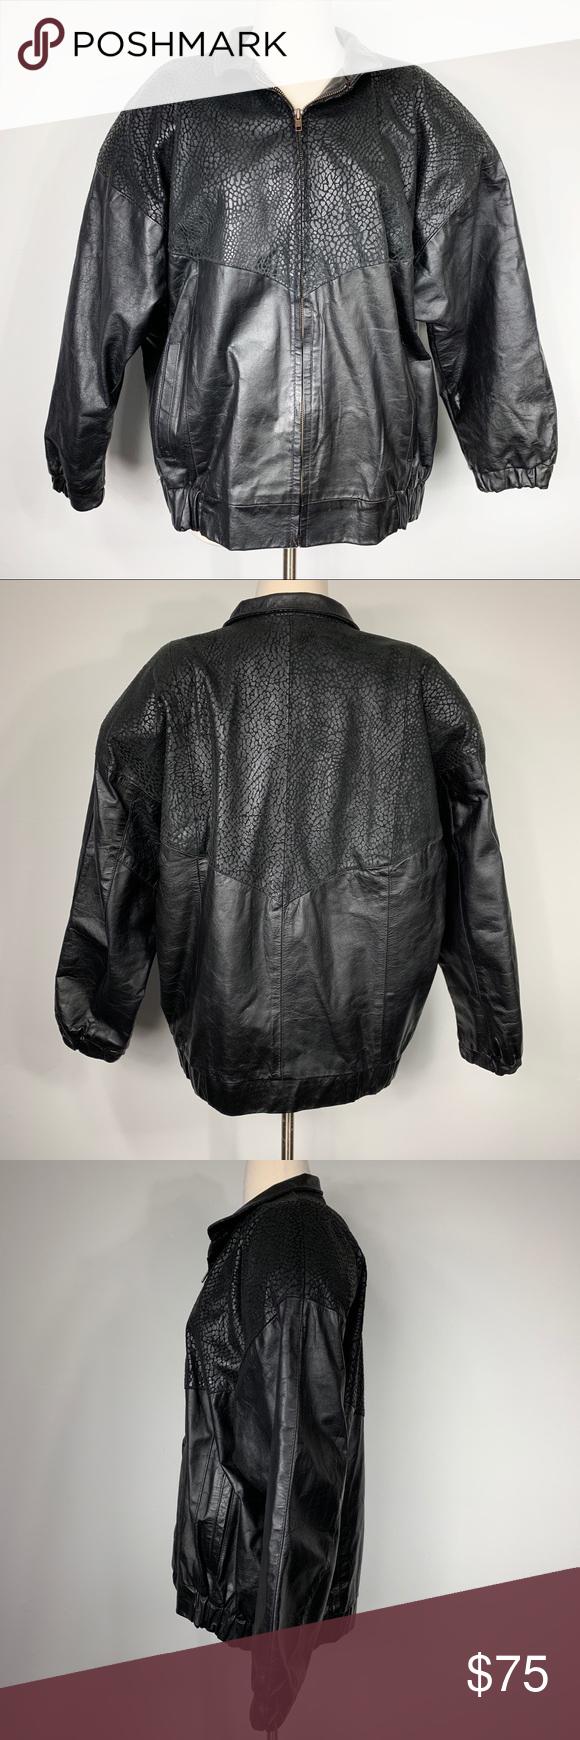 Vintage Oversized Leather Croc Embossed Bomber Vintage Comint Black 100 Genuine Leather Croc Embossed Ov Bomber Jacket Vintage Genuine Leather Jackets Jackets [ 1740 x 580 Pixel ]